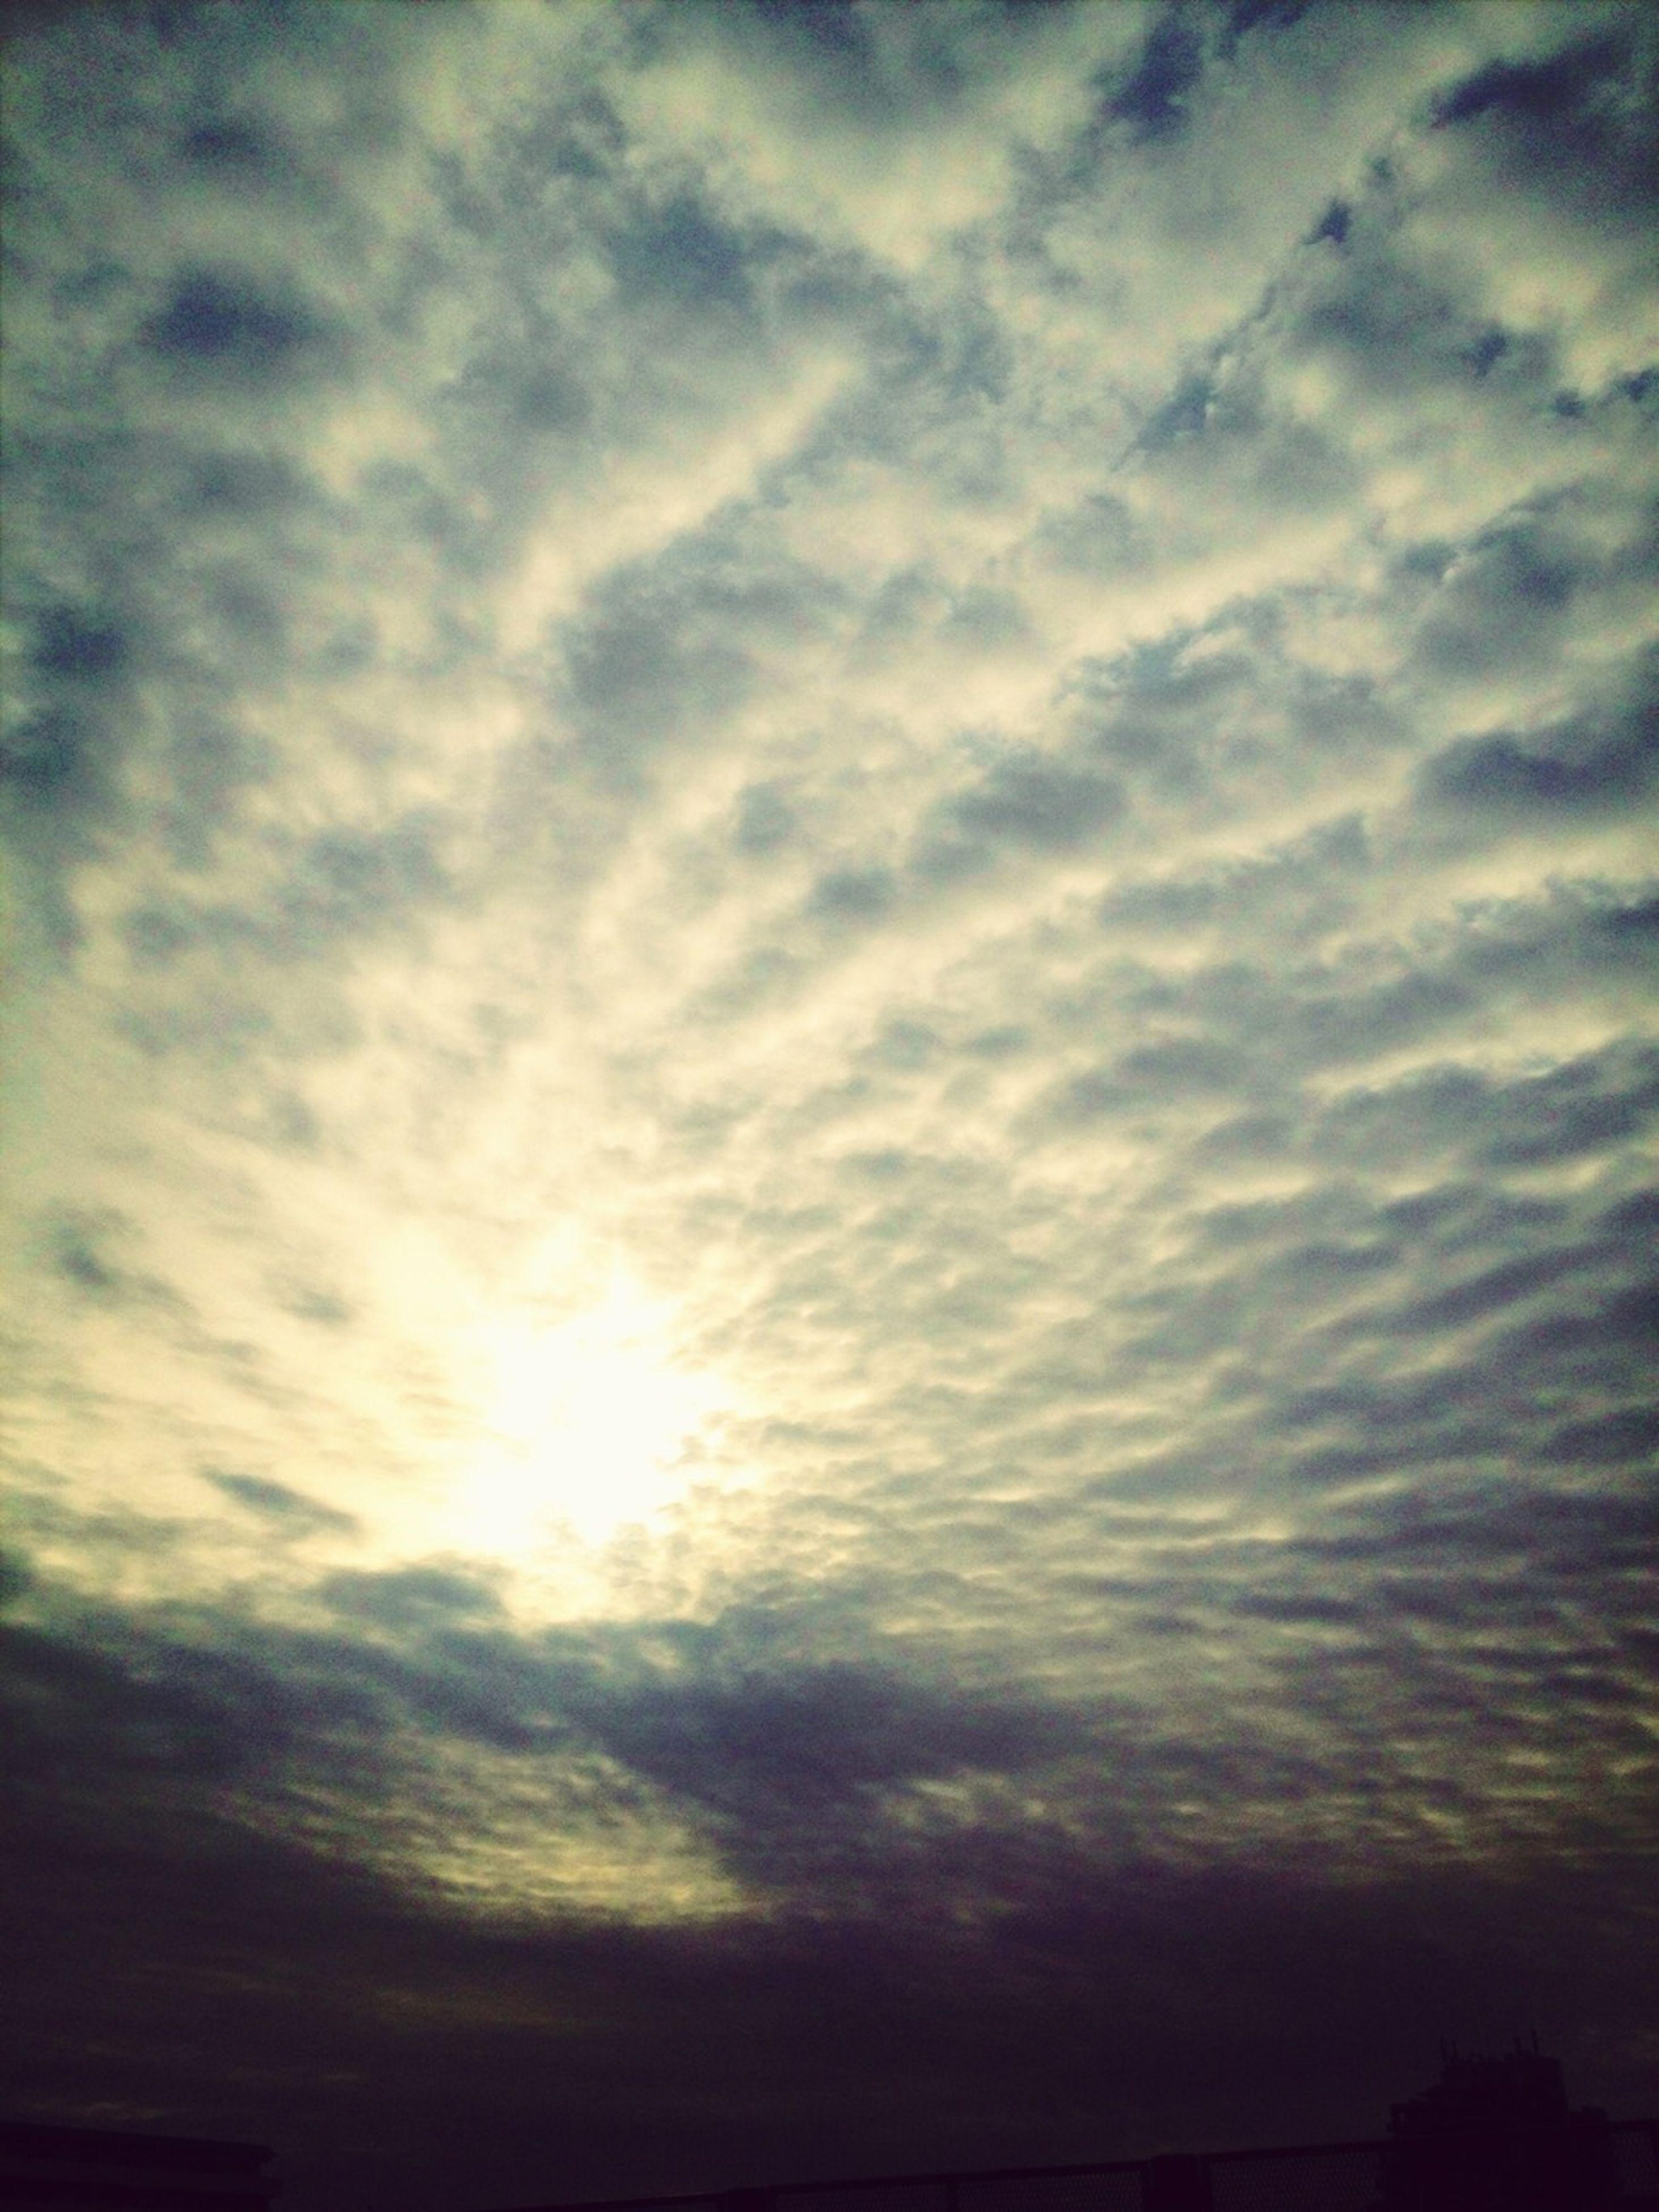 sky, cloud - sky, beauty in nature, scenics, sun, tranquility, sunset, tranquil scene, cloudy, nature, sunbeam, low angle view, cloud, cloudscape, sunlight, idyllic, silhouette, weather, outdoors, no people